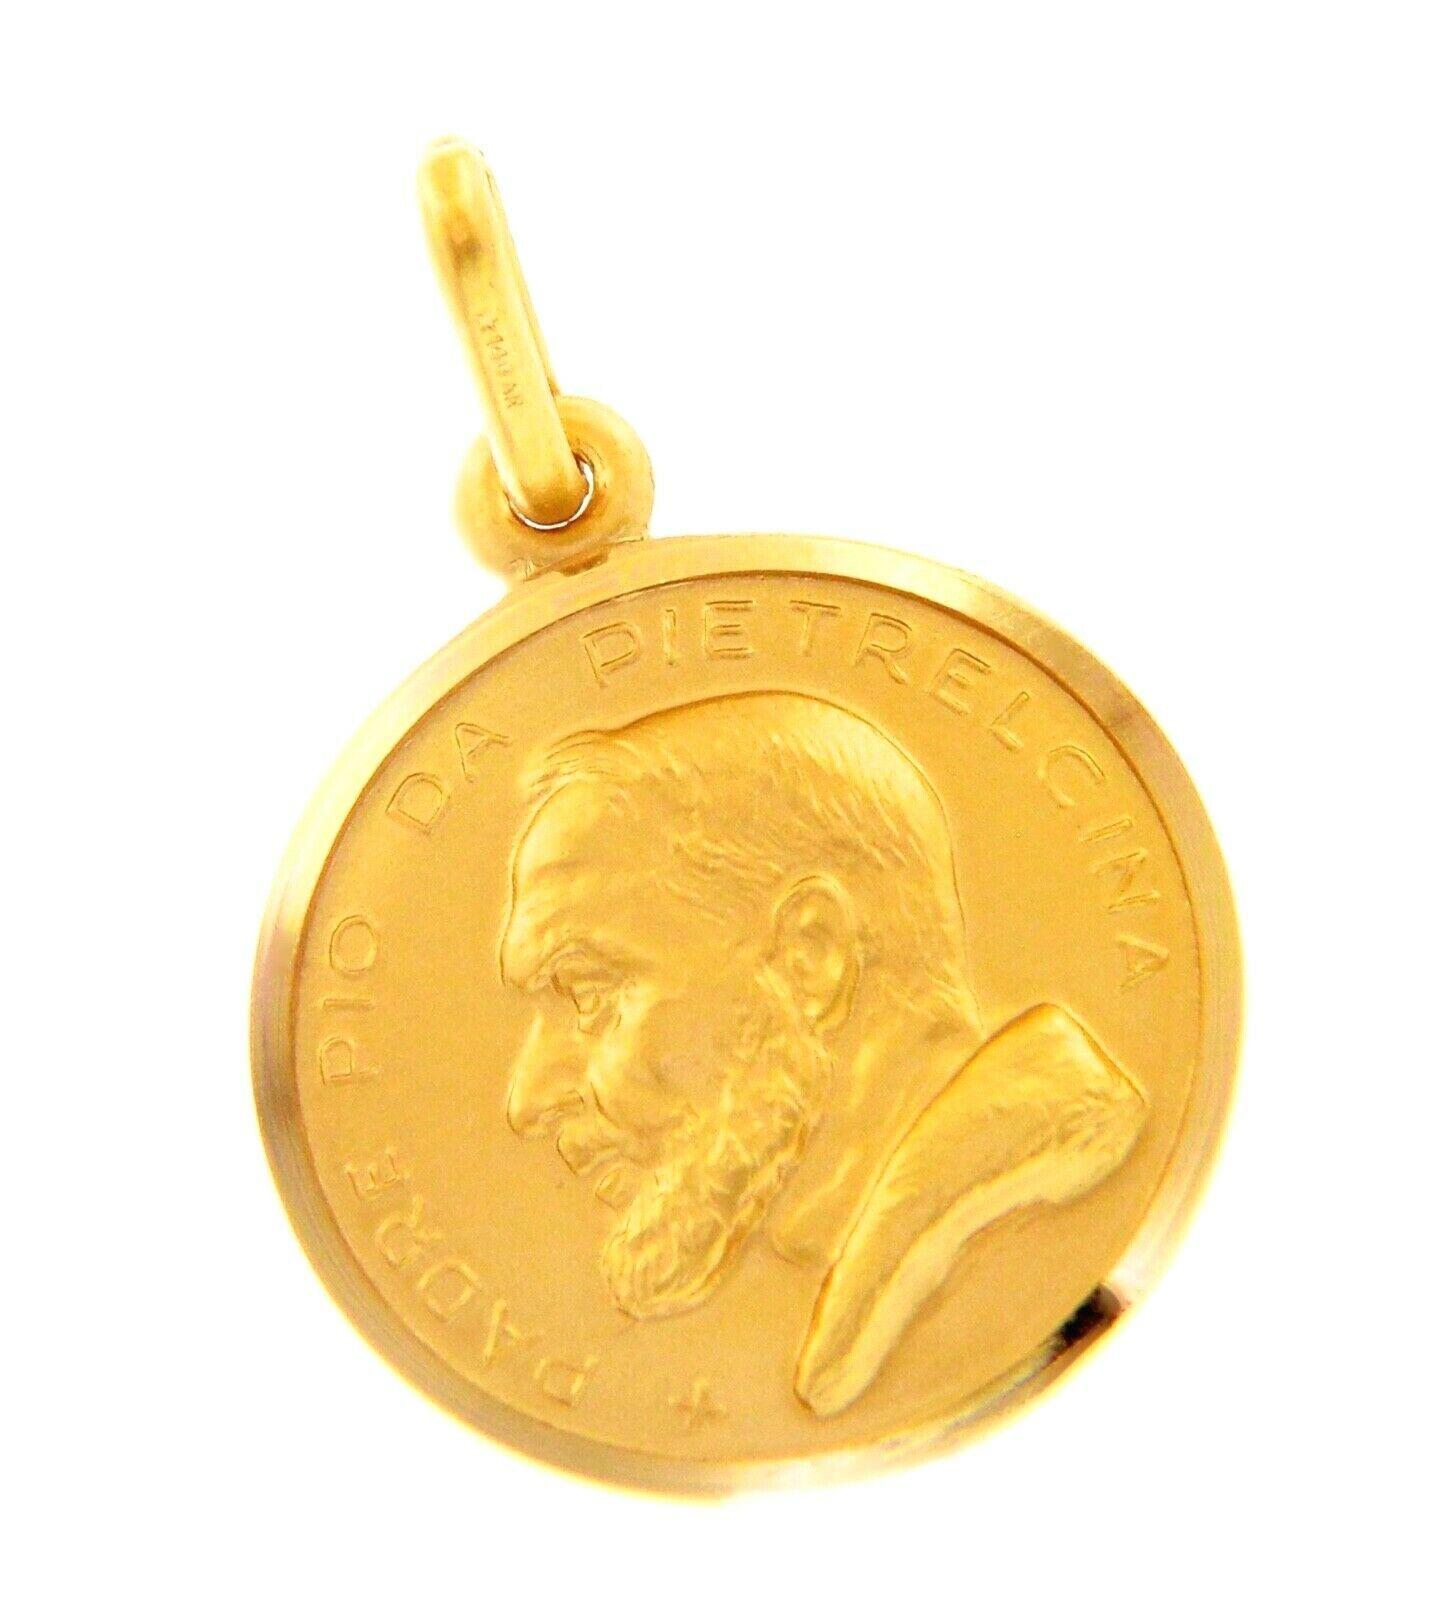 18K YELLOW GOLD MEDAL PENDANT, SAINT PIO OF PIETRELCINA 17mm VERY DETAILED